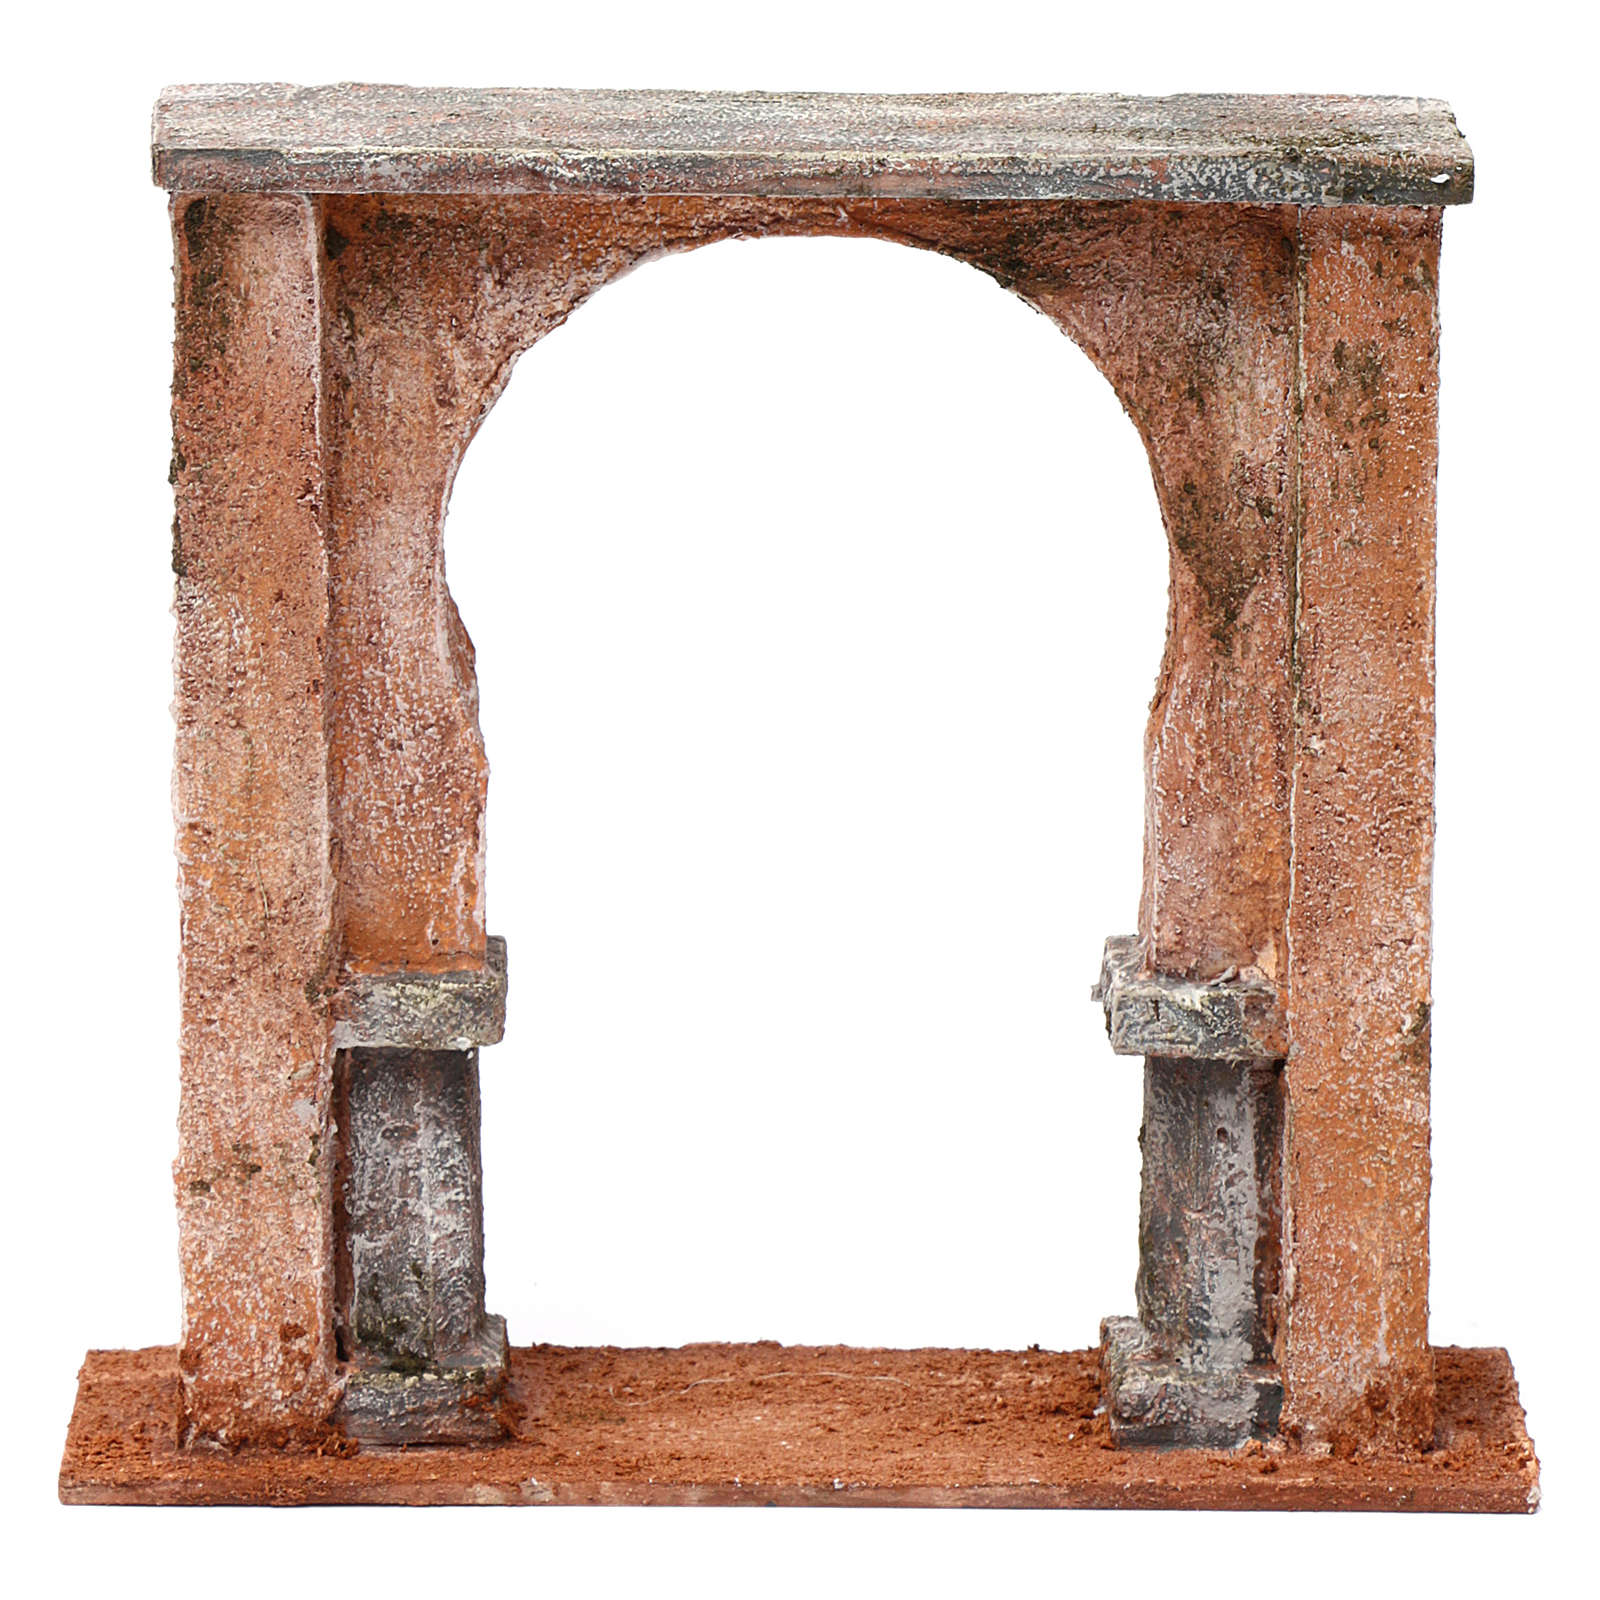 Pared ventana de arco para belén 12 cm 20x20x5 cm estilo palestino 4